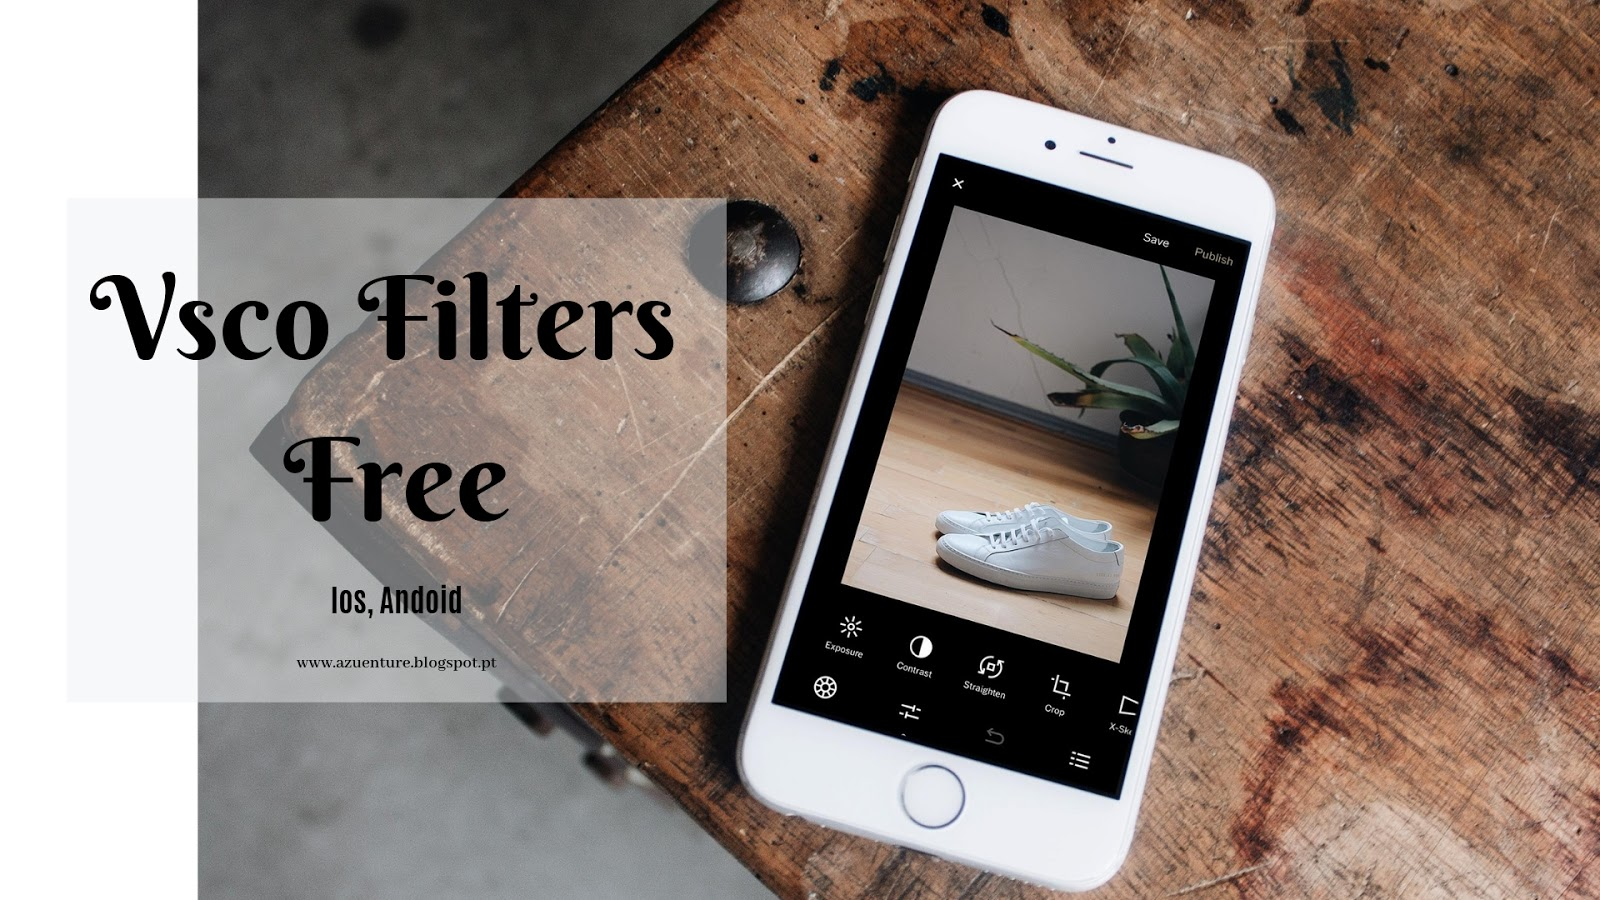 Vsco Filters Free